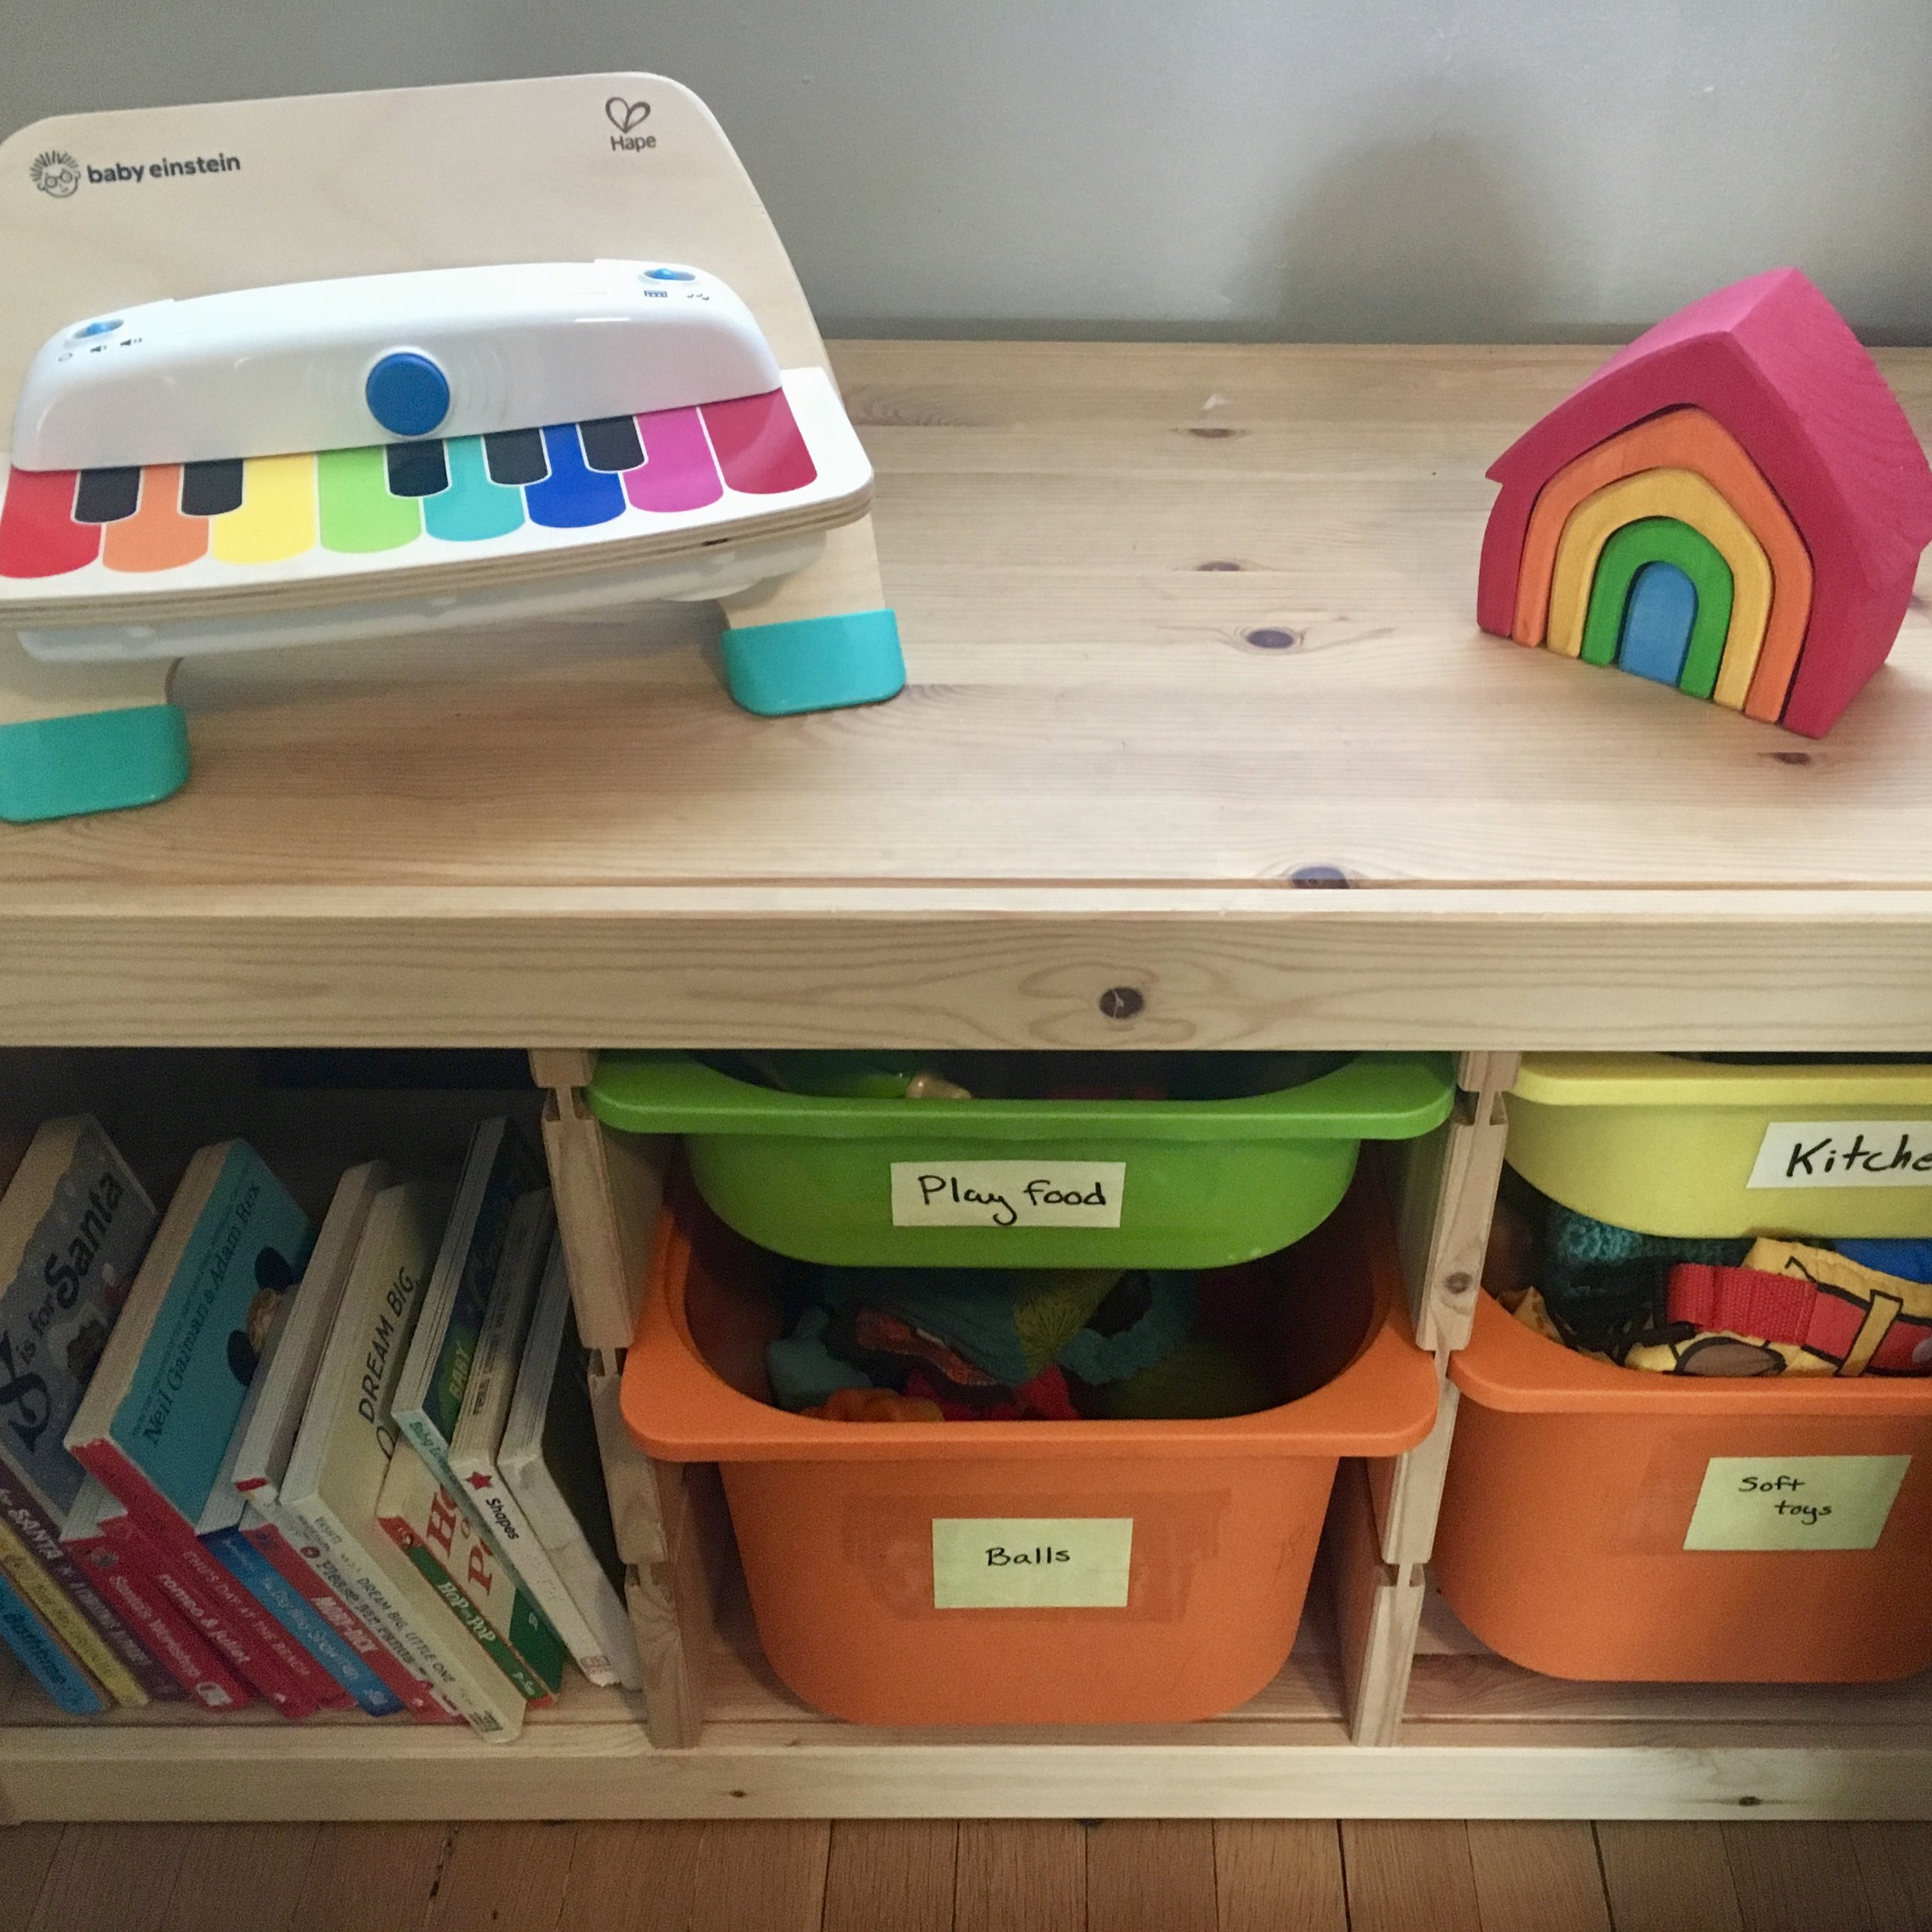 Image: Shelves of toddler toys